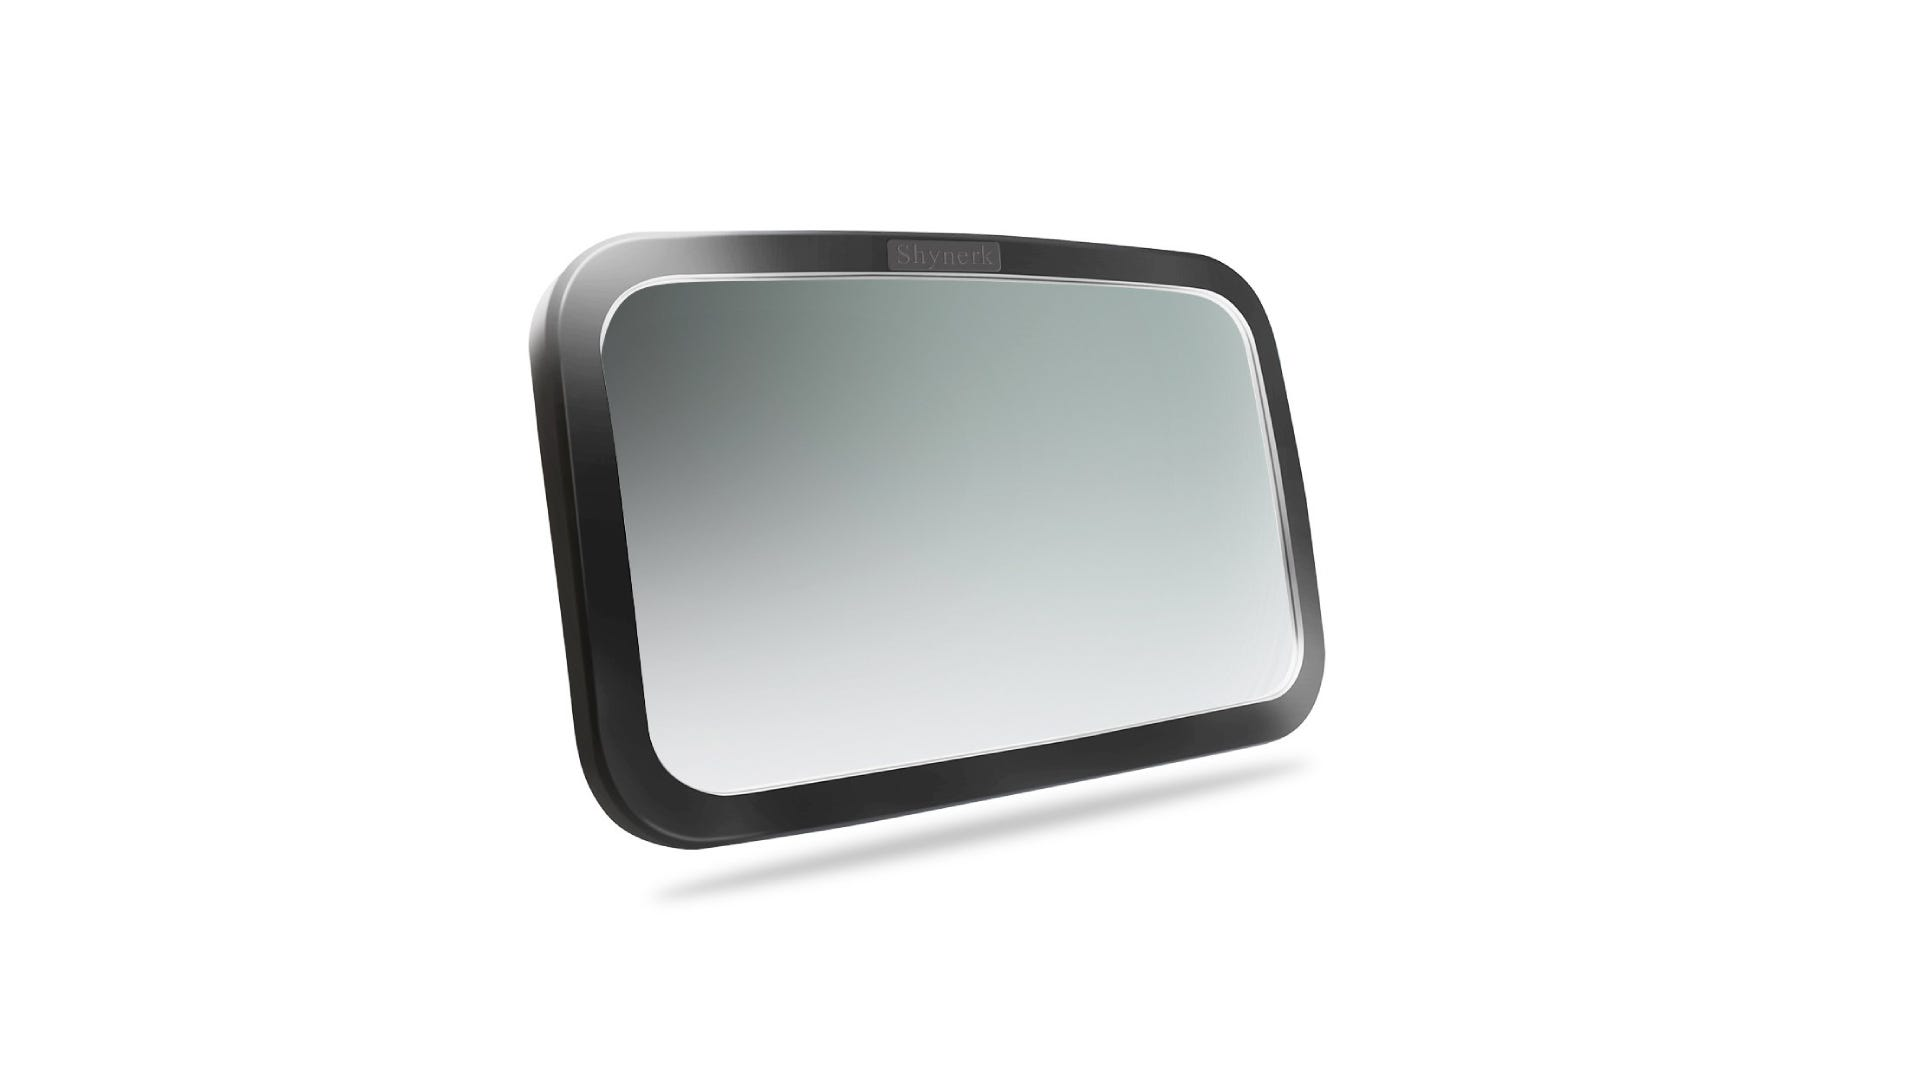 a baby car seat mirror with a black rim